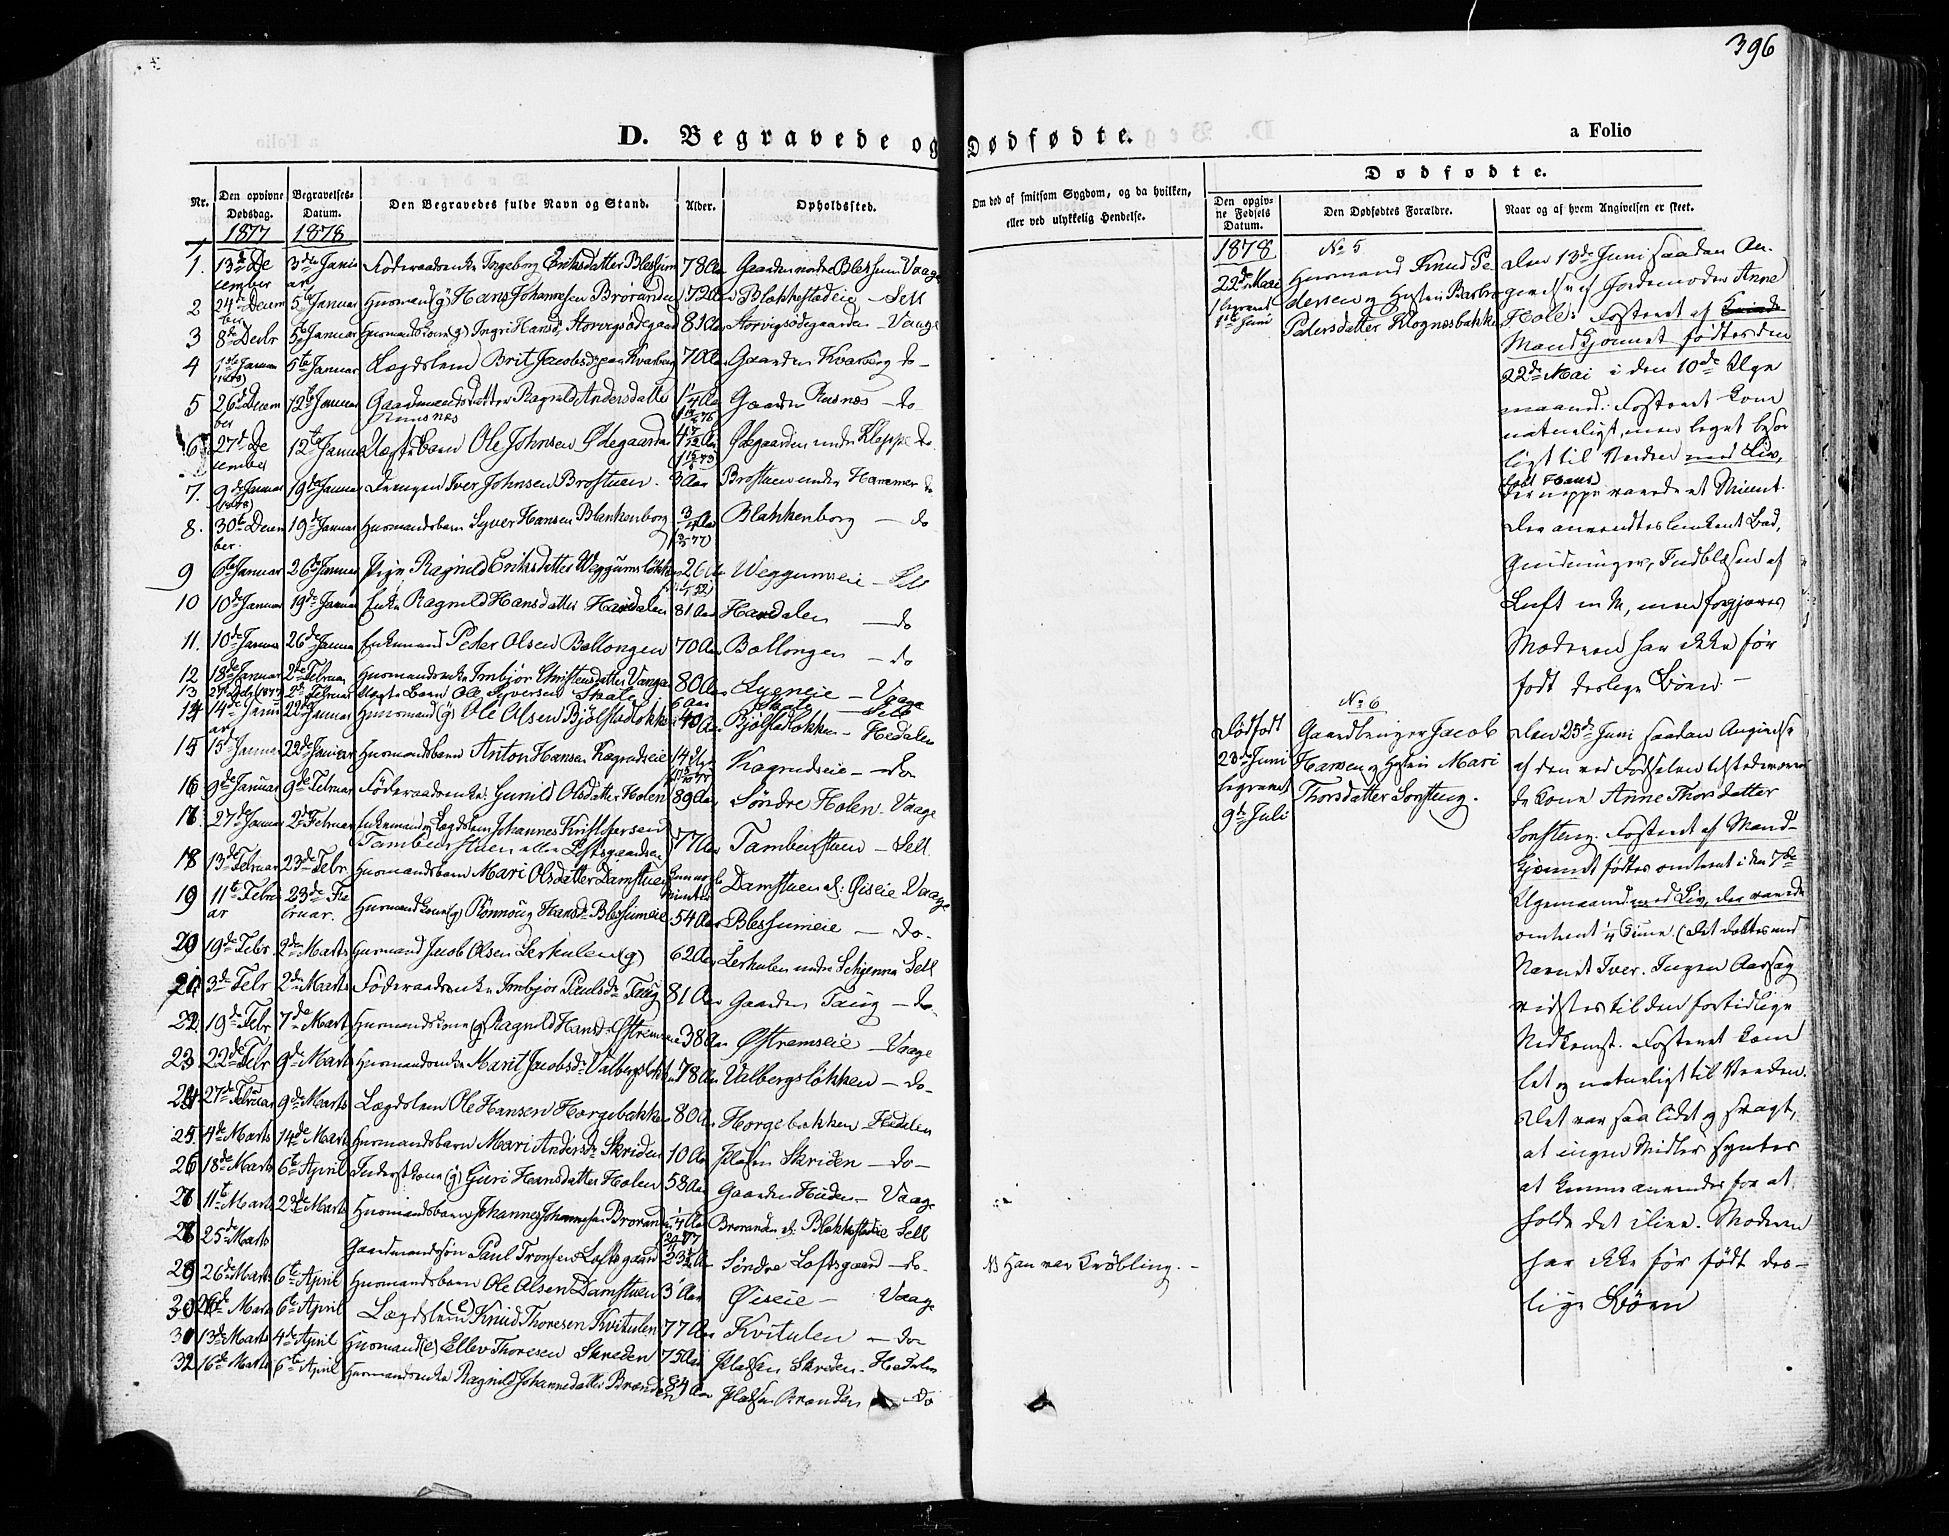 SAH, Vågå prestekontor, Ministerialbok nr. 7 /1, 1872-1886, s. 396